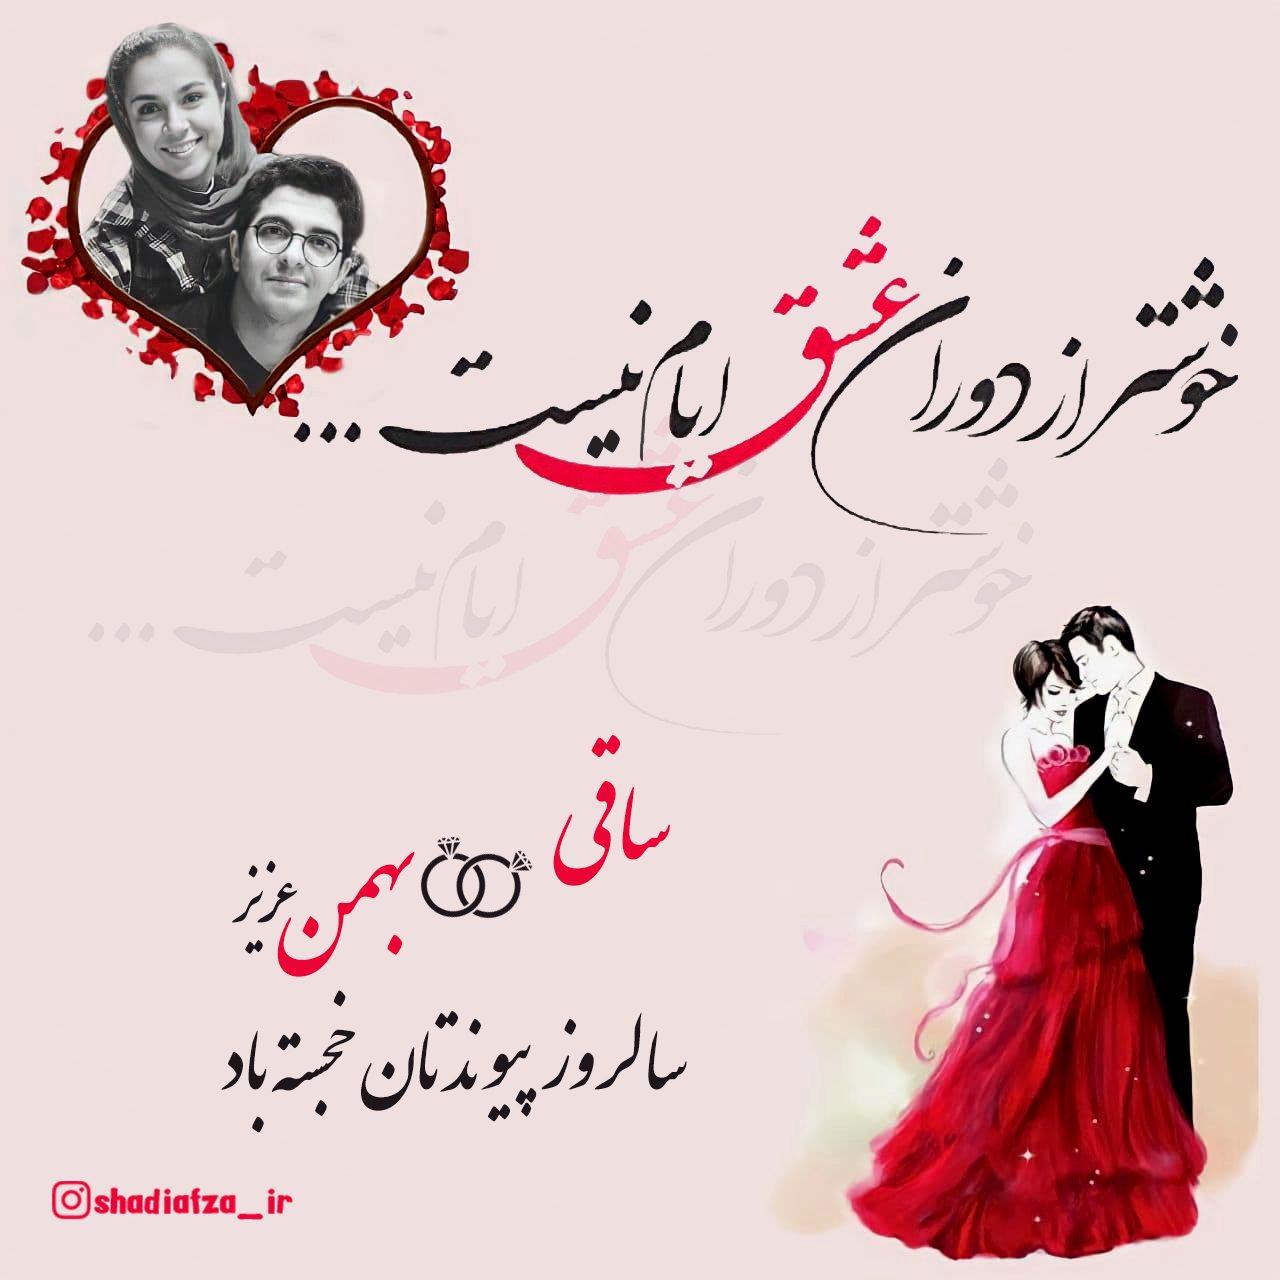 عکس نوشته ازدواج ساقی و بهمن